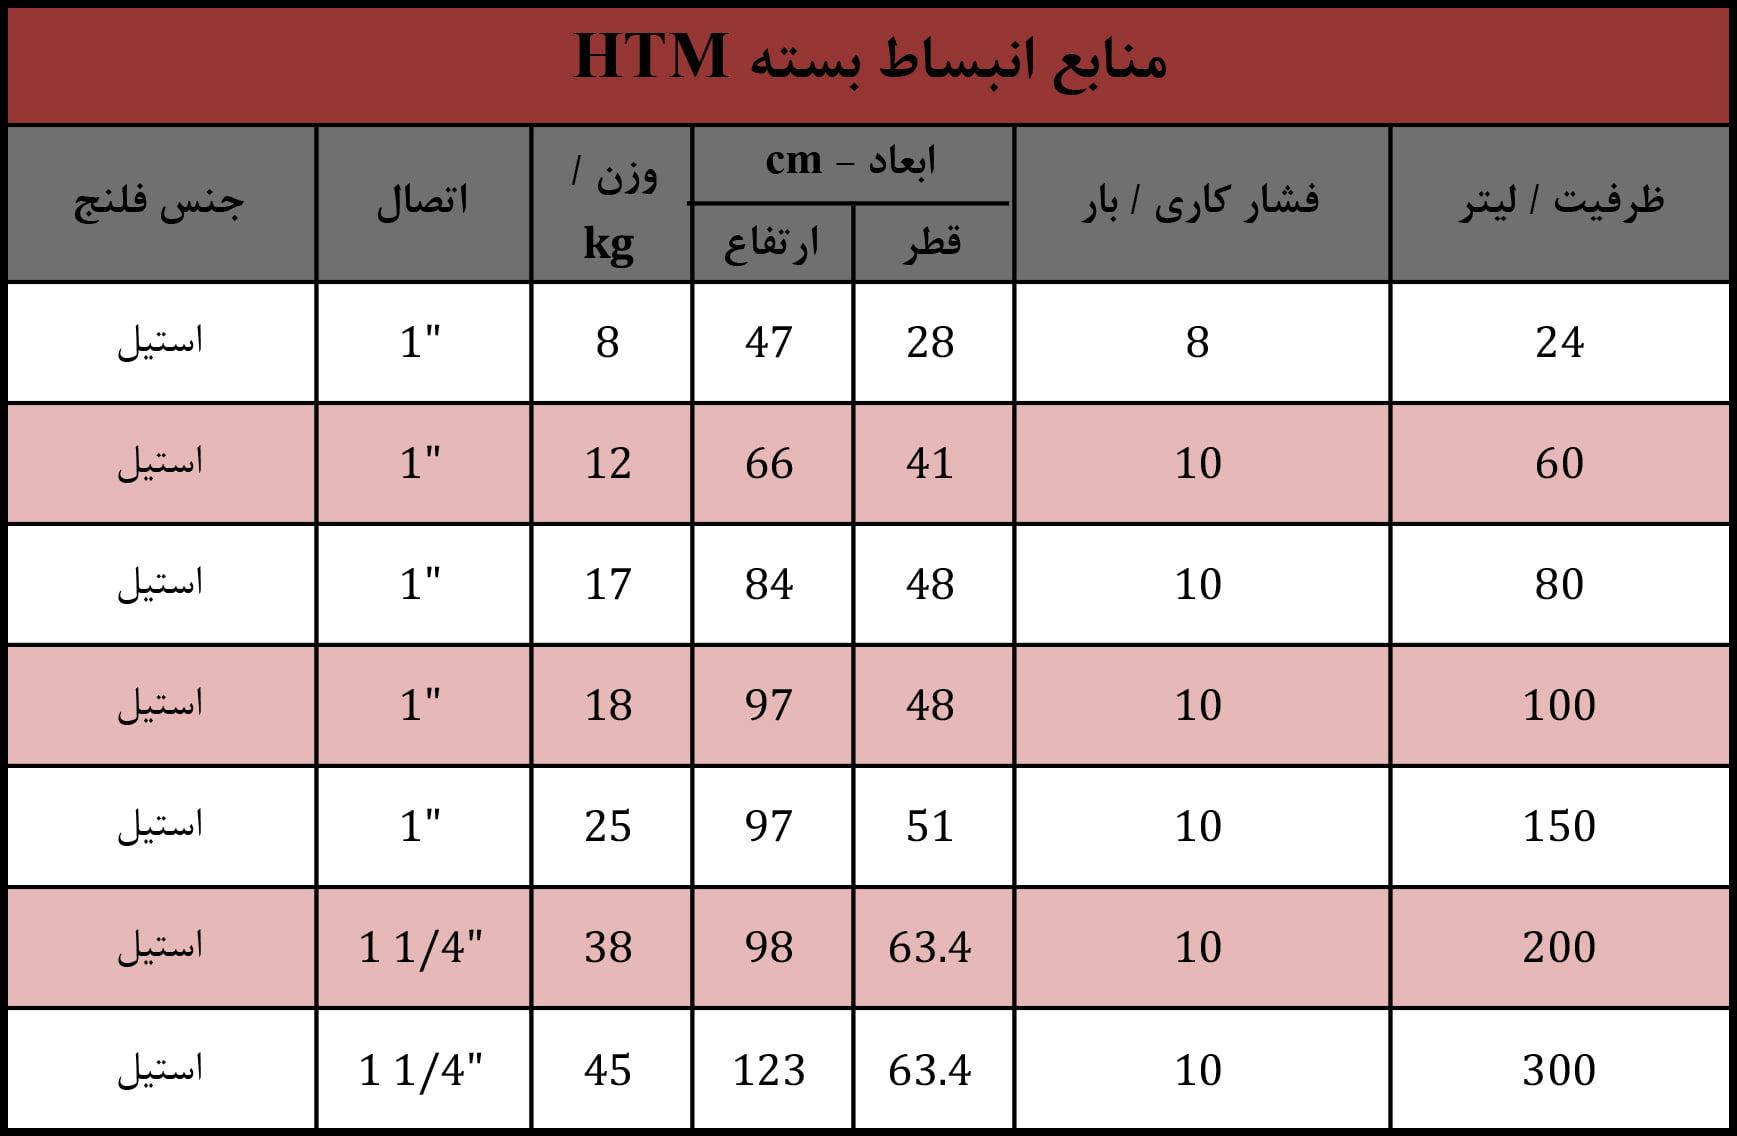 منابع انبساط بسته HTM